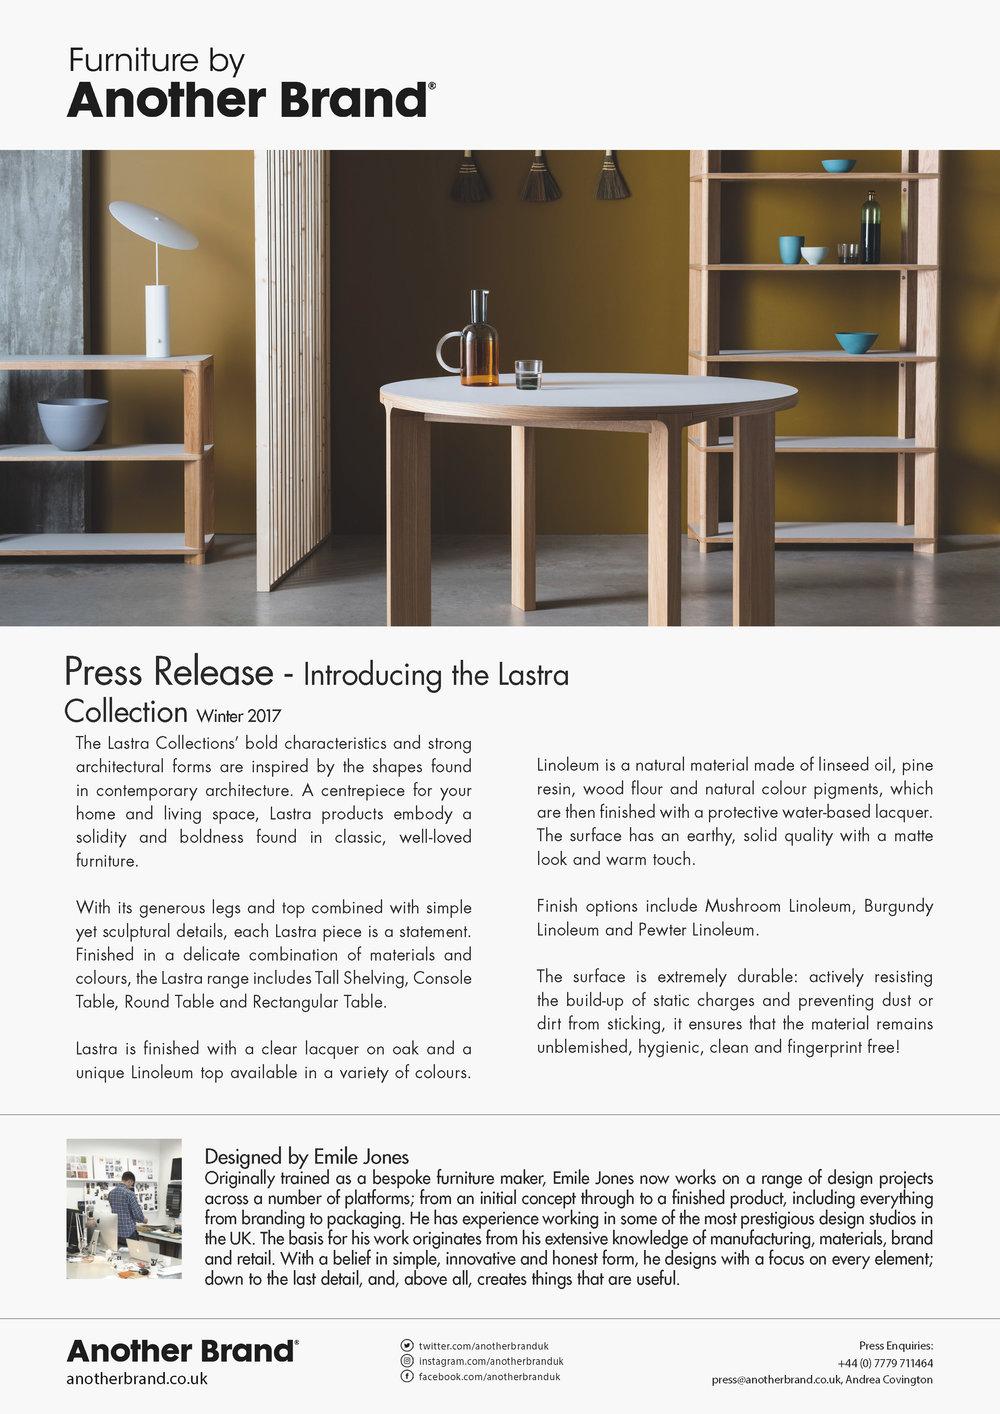 Another Brand_PressRelease_Lastra.jpg